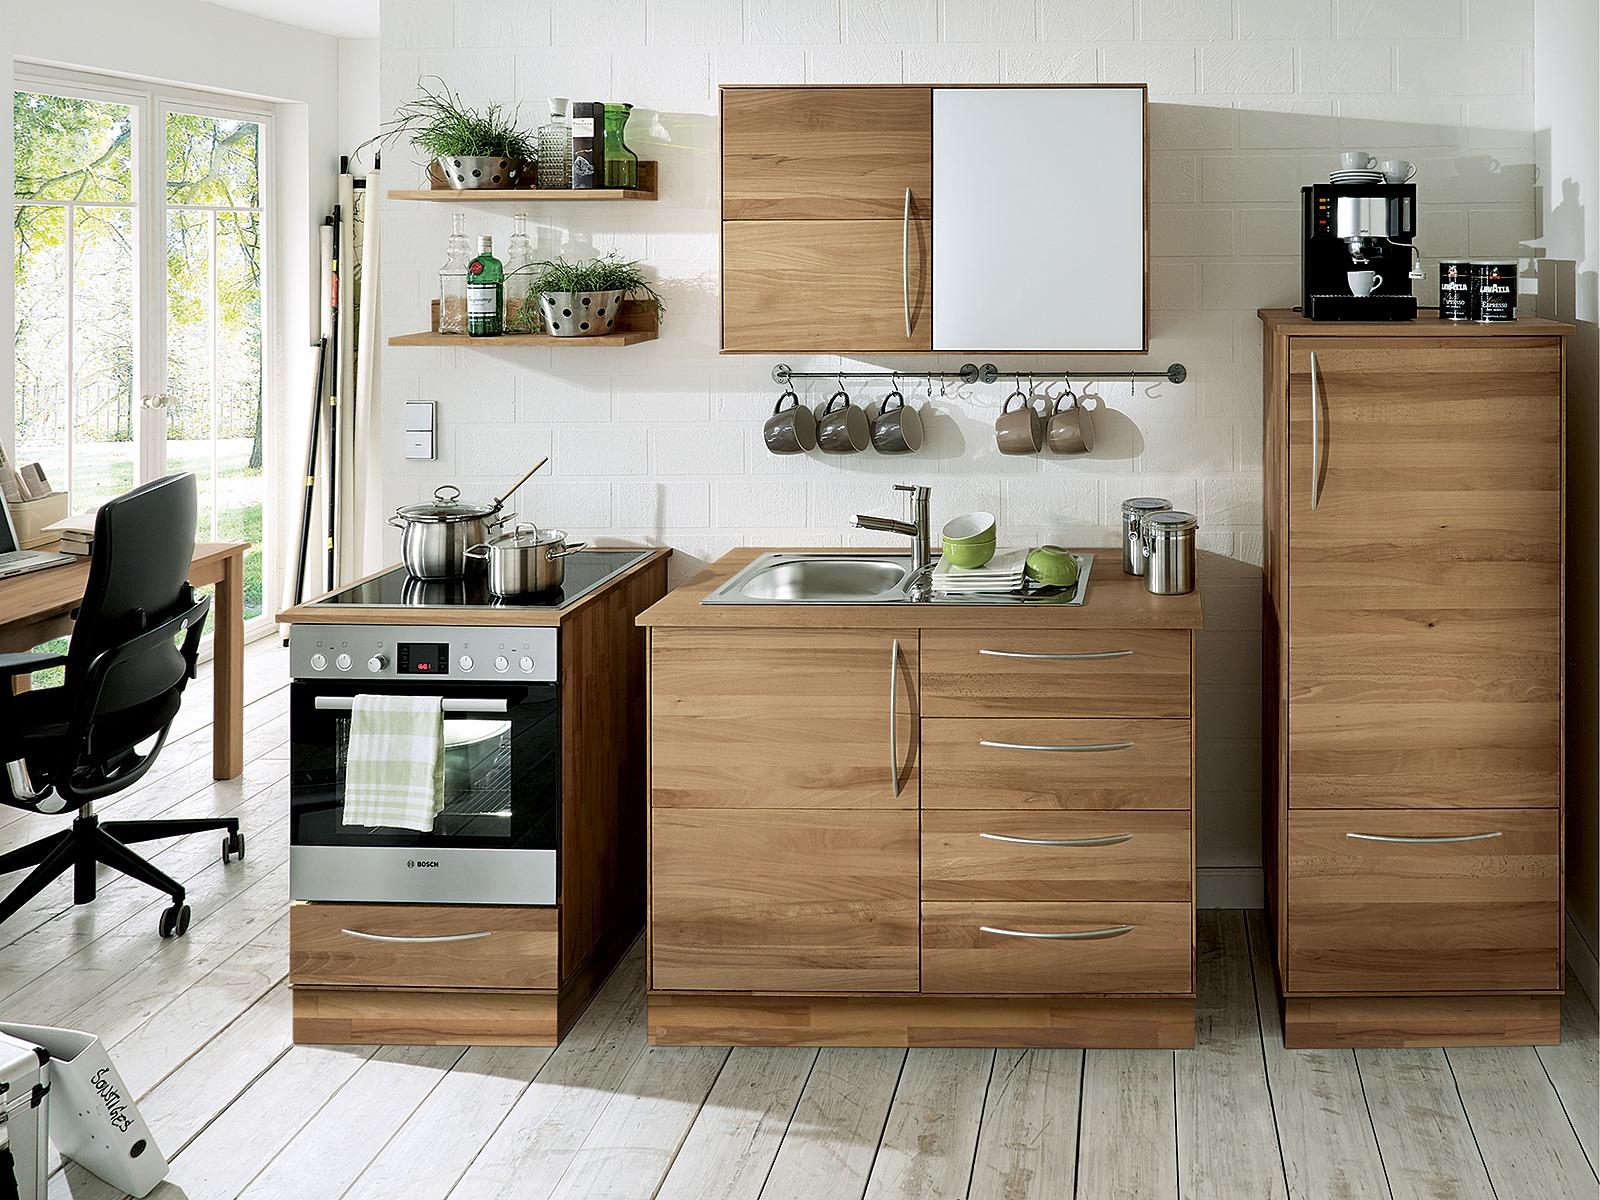 k chenh ngeschrank culinara eiche. Black Bedroom Furniture Sets. Home Design Ideas